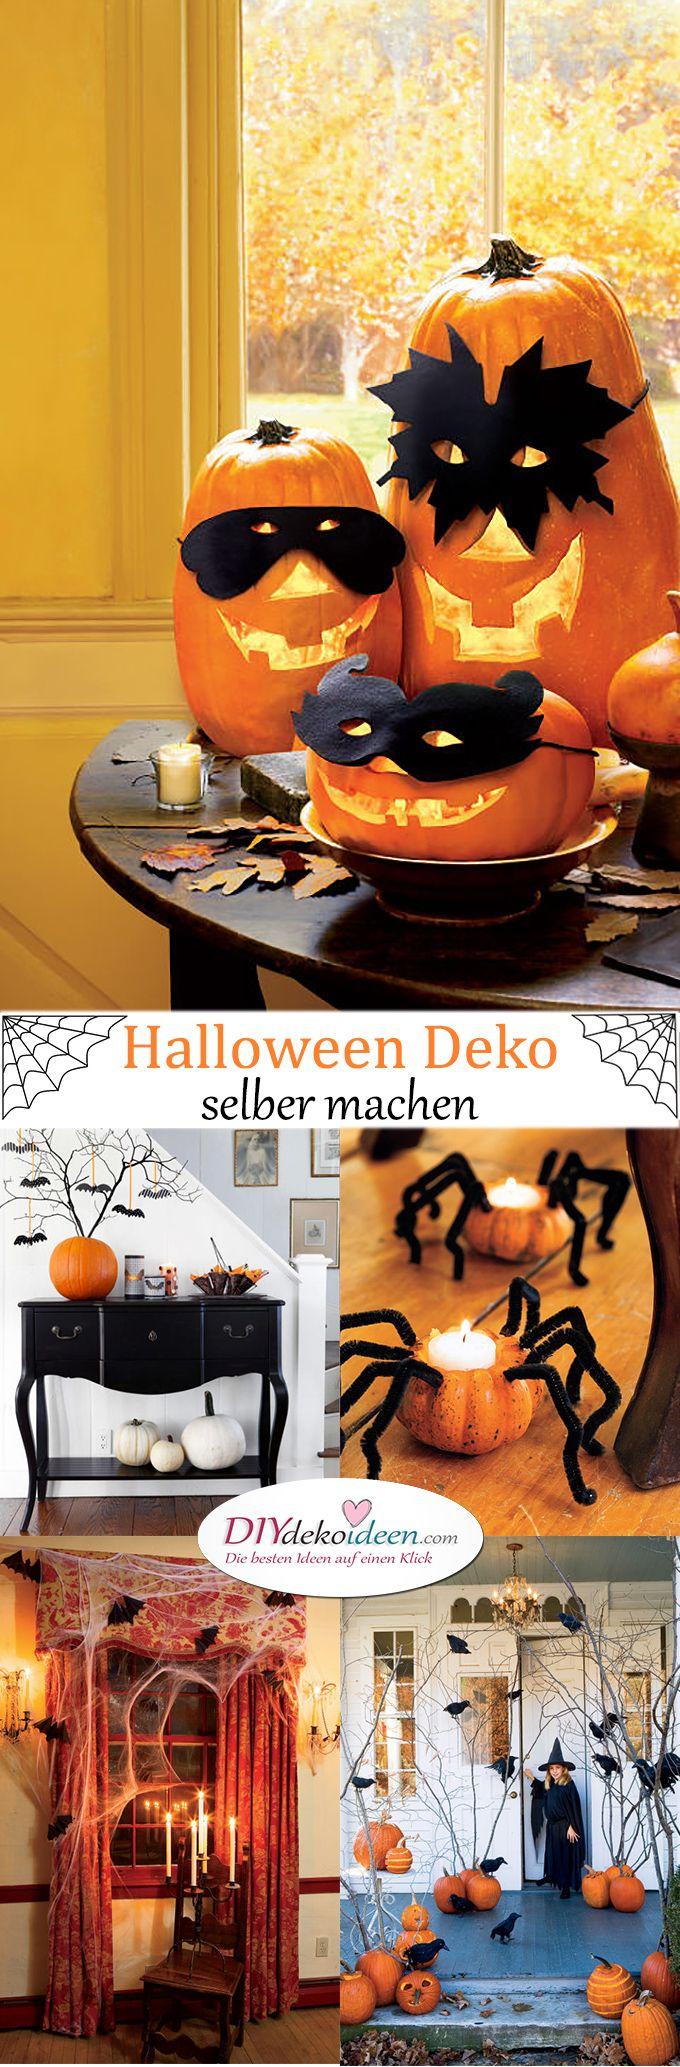 halloween deko selber machen f r eine gruselige party diy deko ideen halloween deko. Black Bedroom Furniture Sets. Home Design Ideas